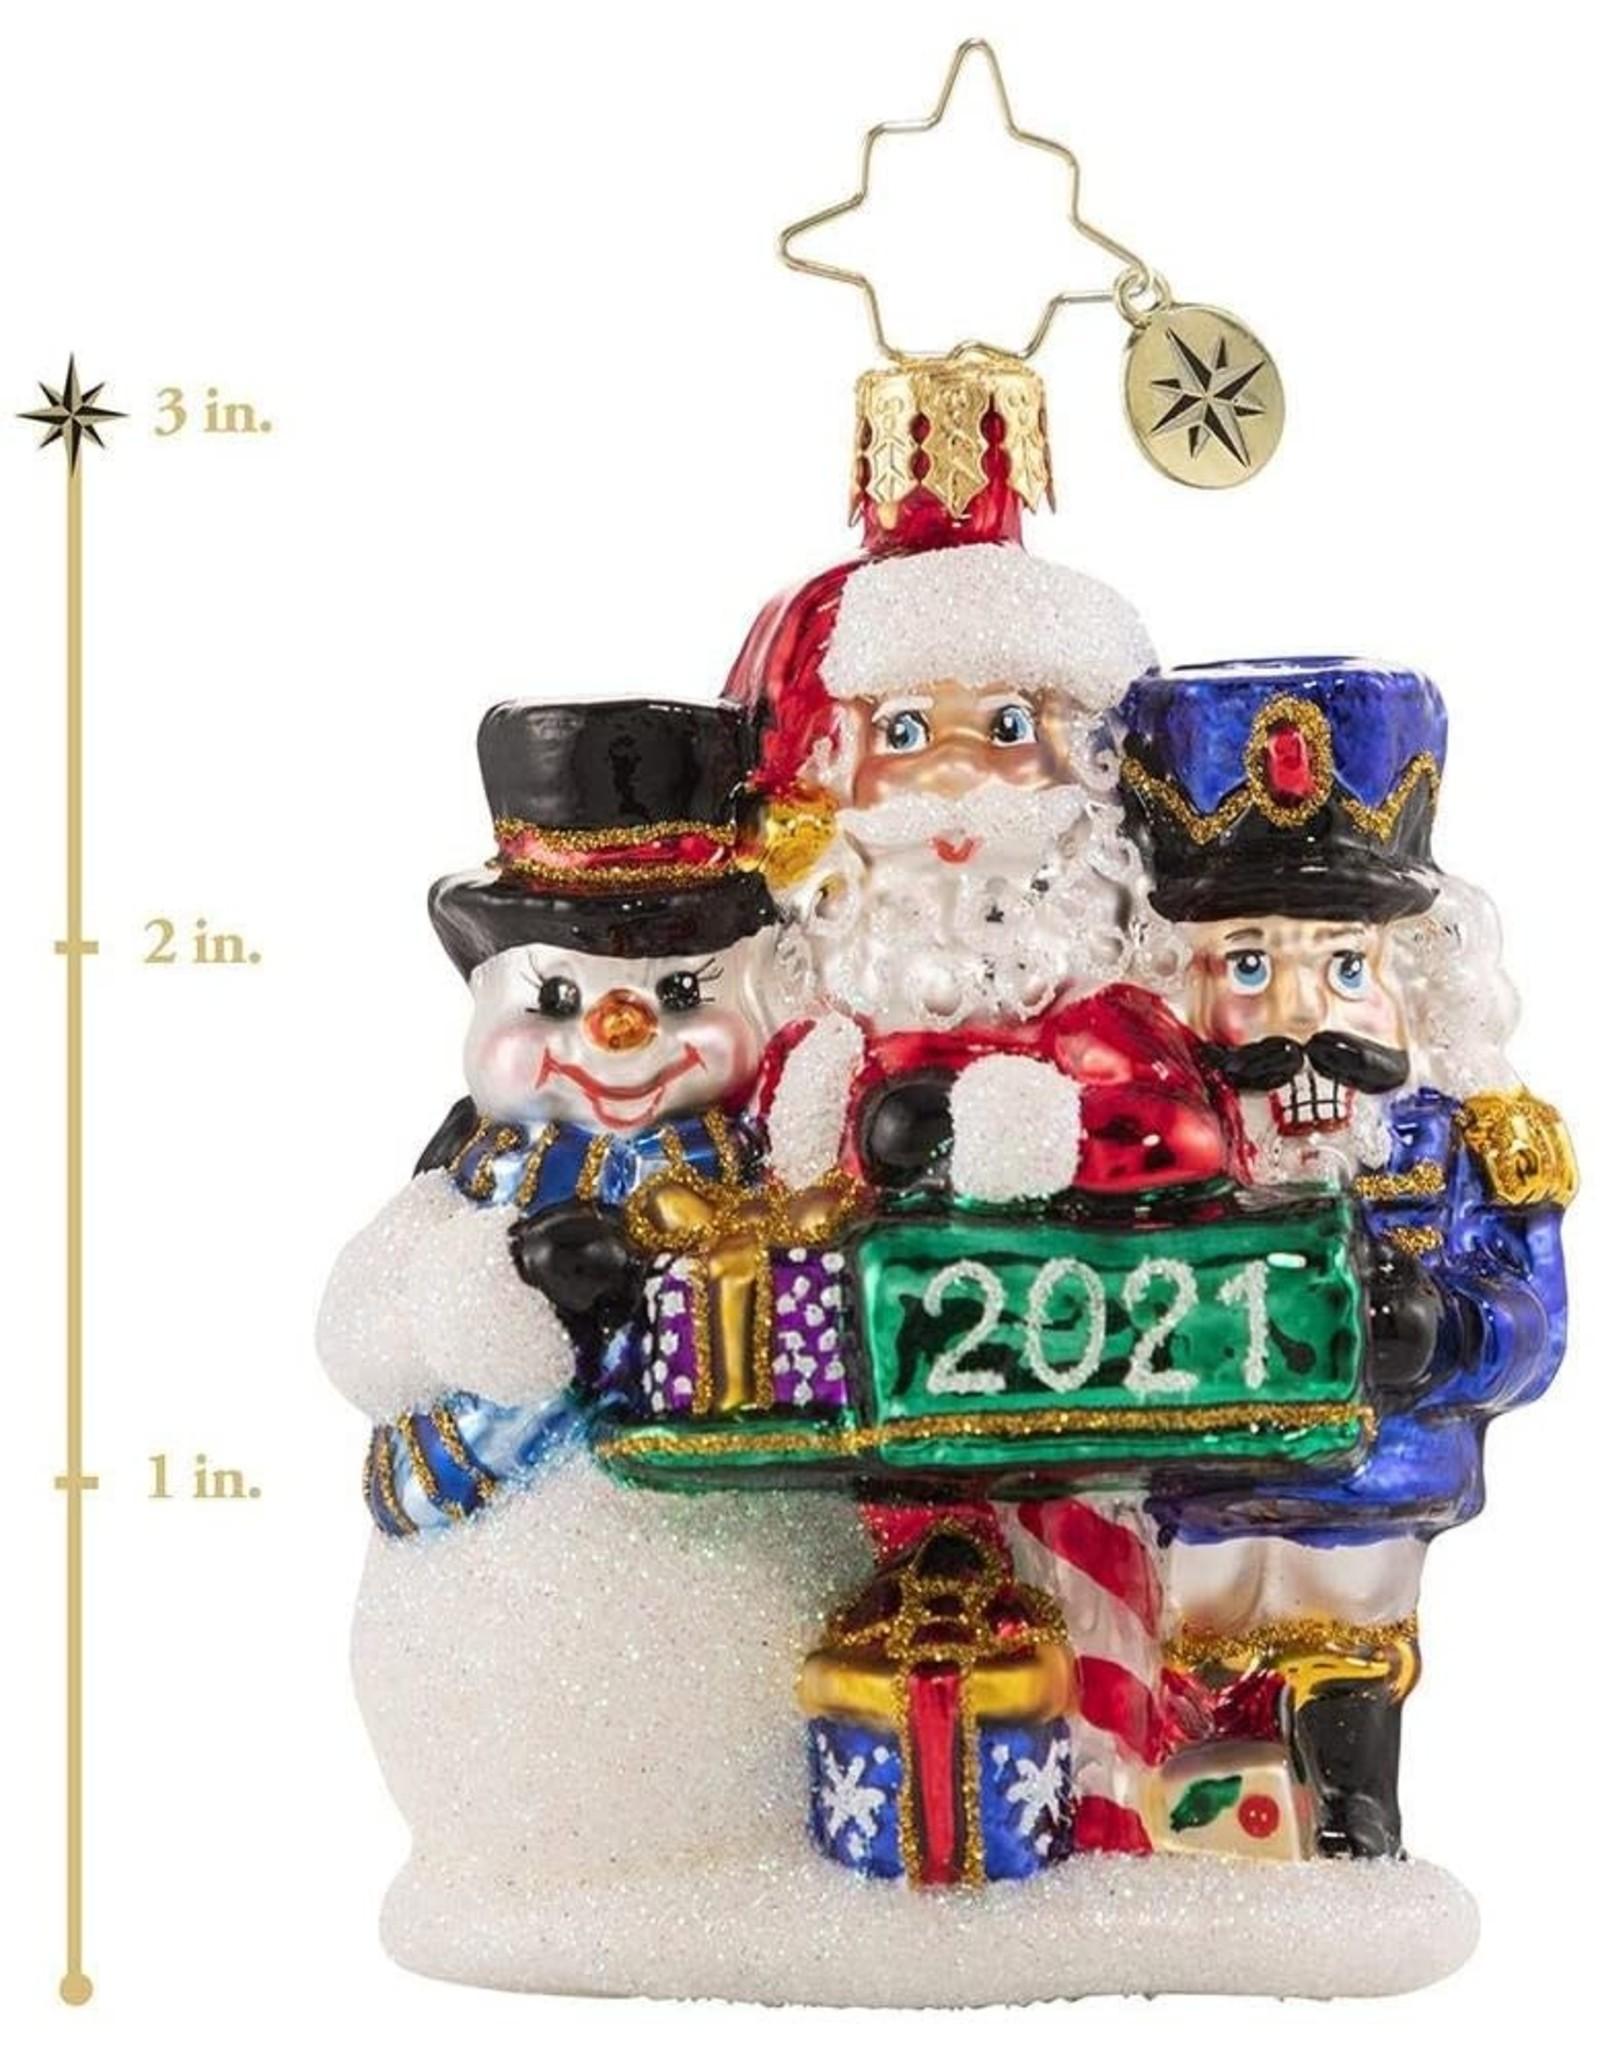 Christopher Radko A Forever-Treasured Trio 2021 Gem Ornament 3 inch